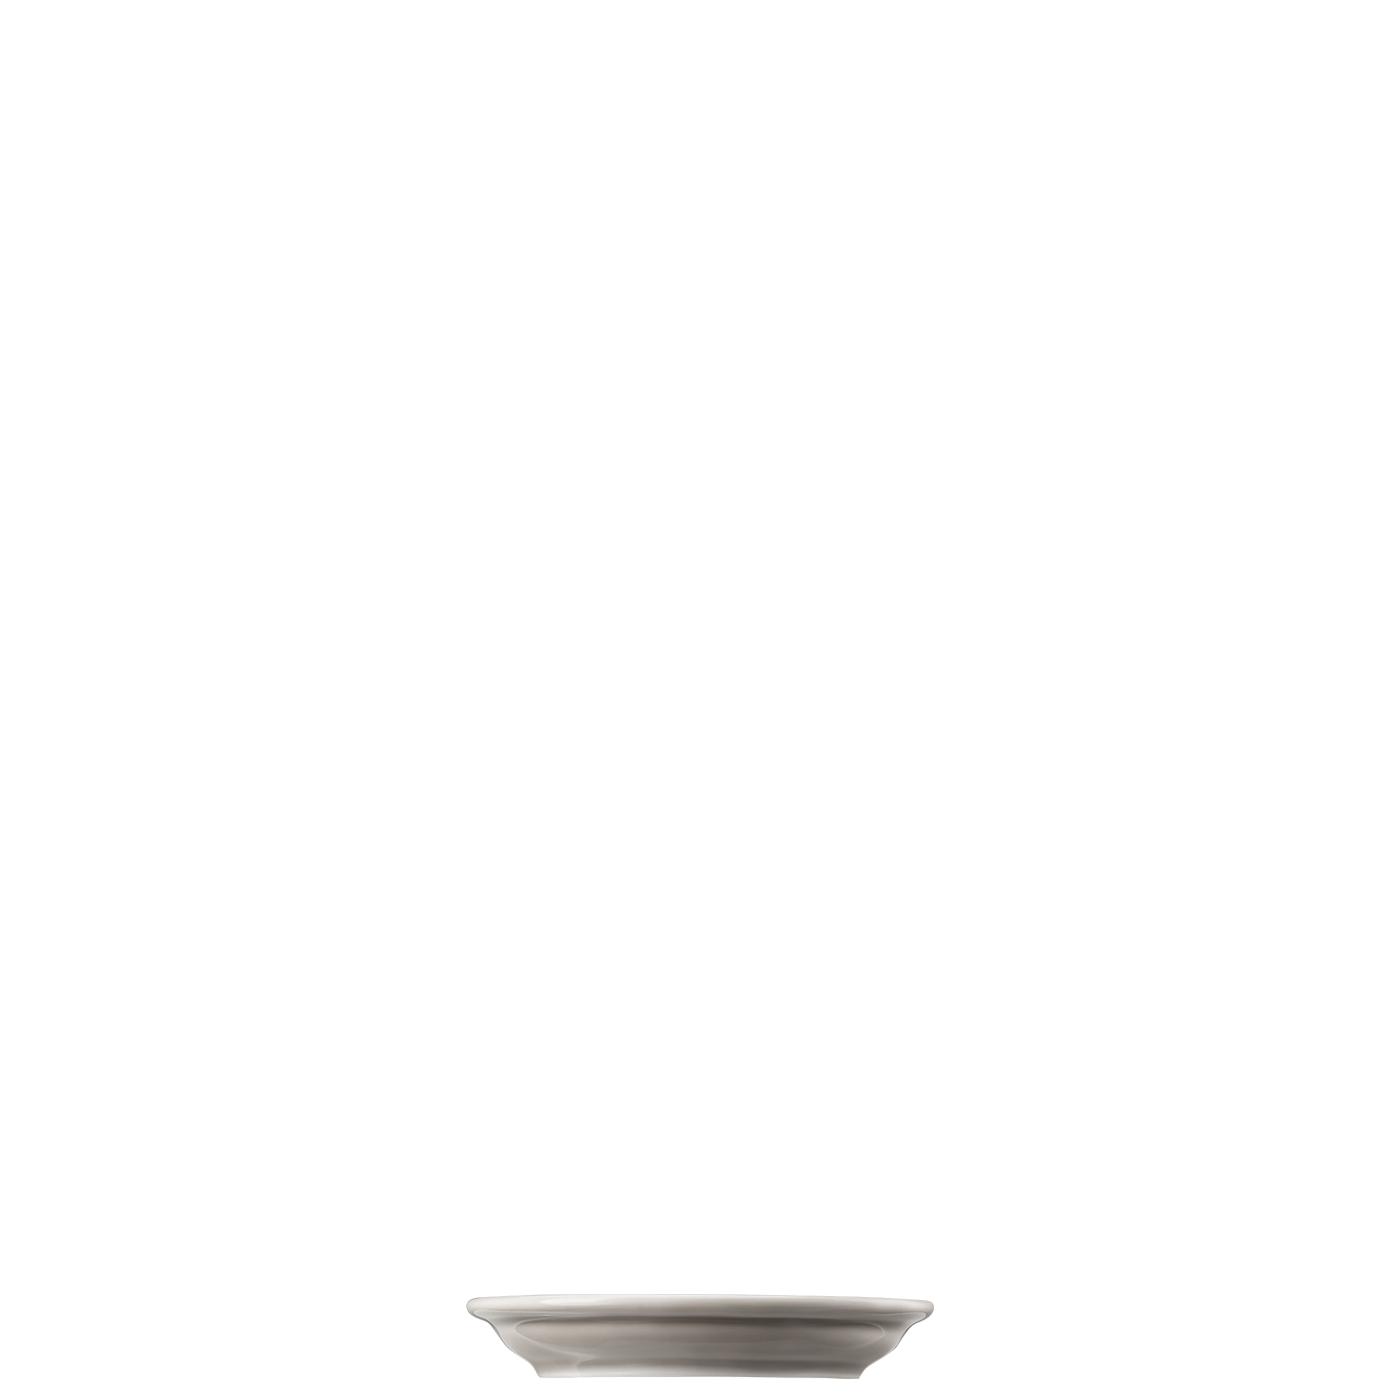 Espresso-Untertasse Trend Colour Moon Grey Thomas Porzellan